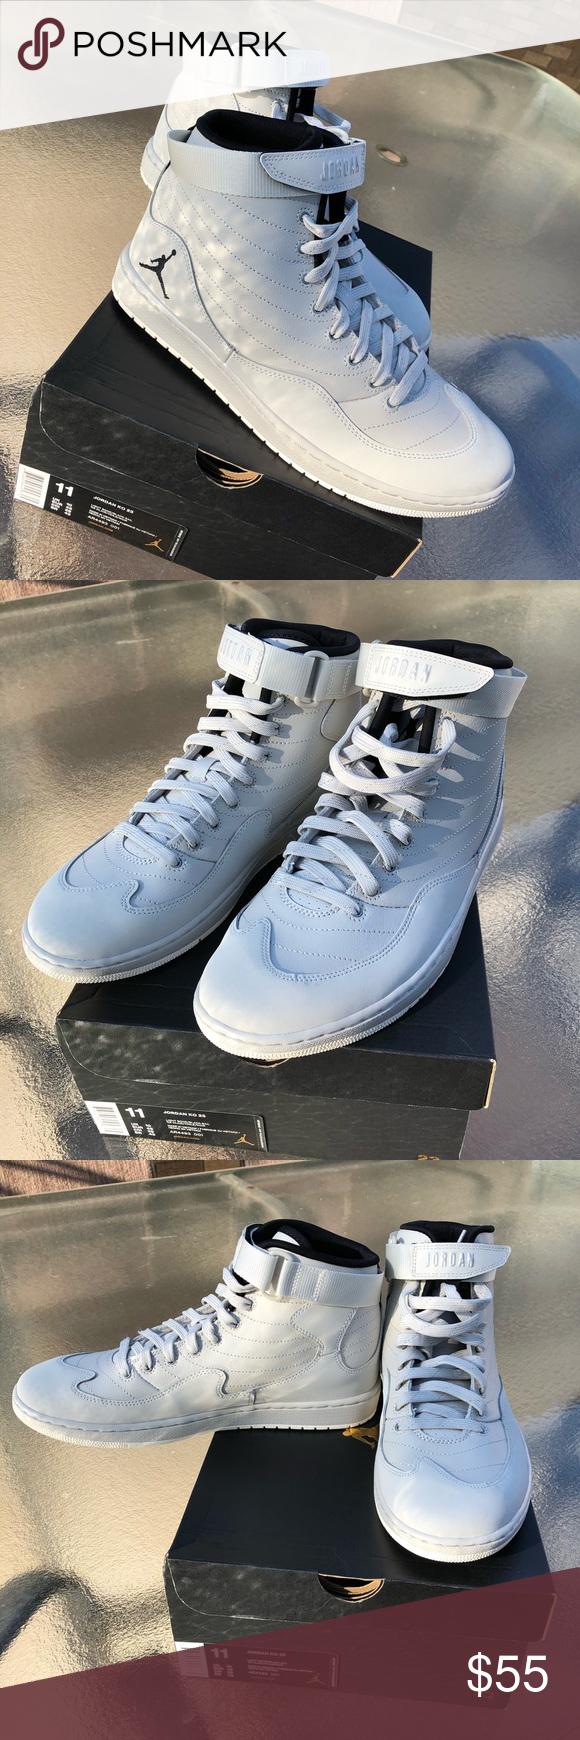 🆕Men's Air Jordan SOG off-court shoes